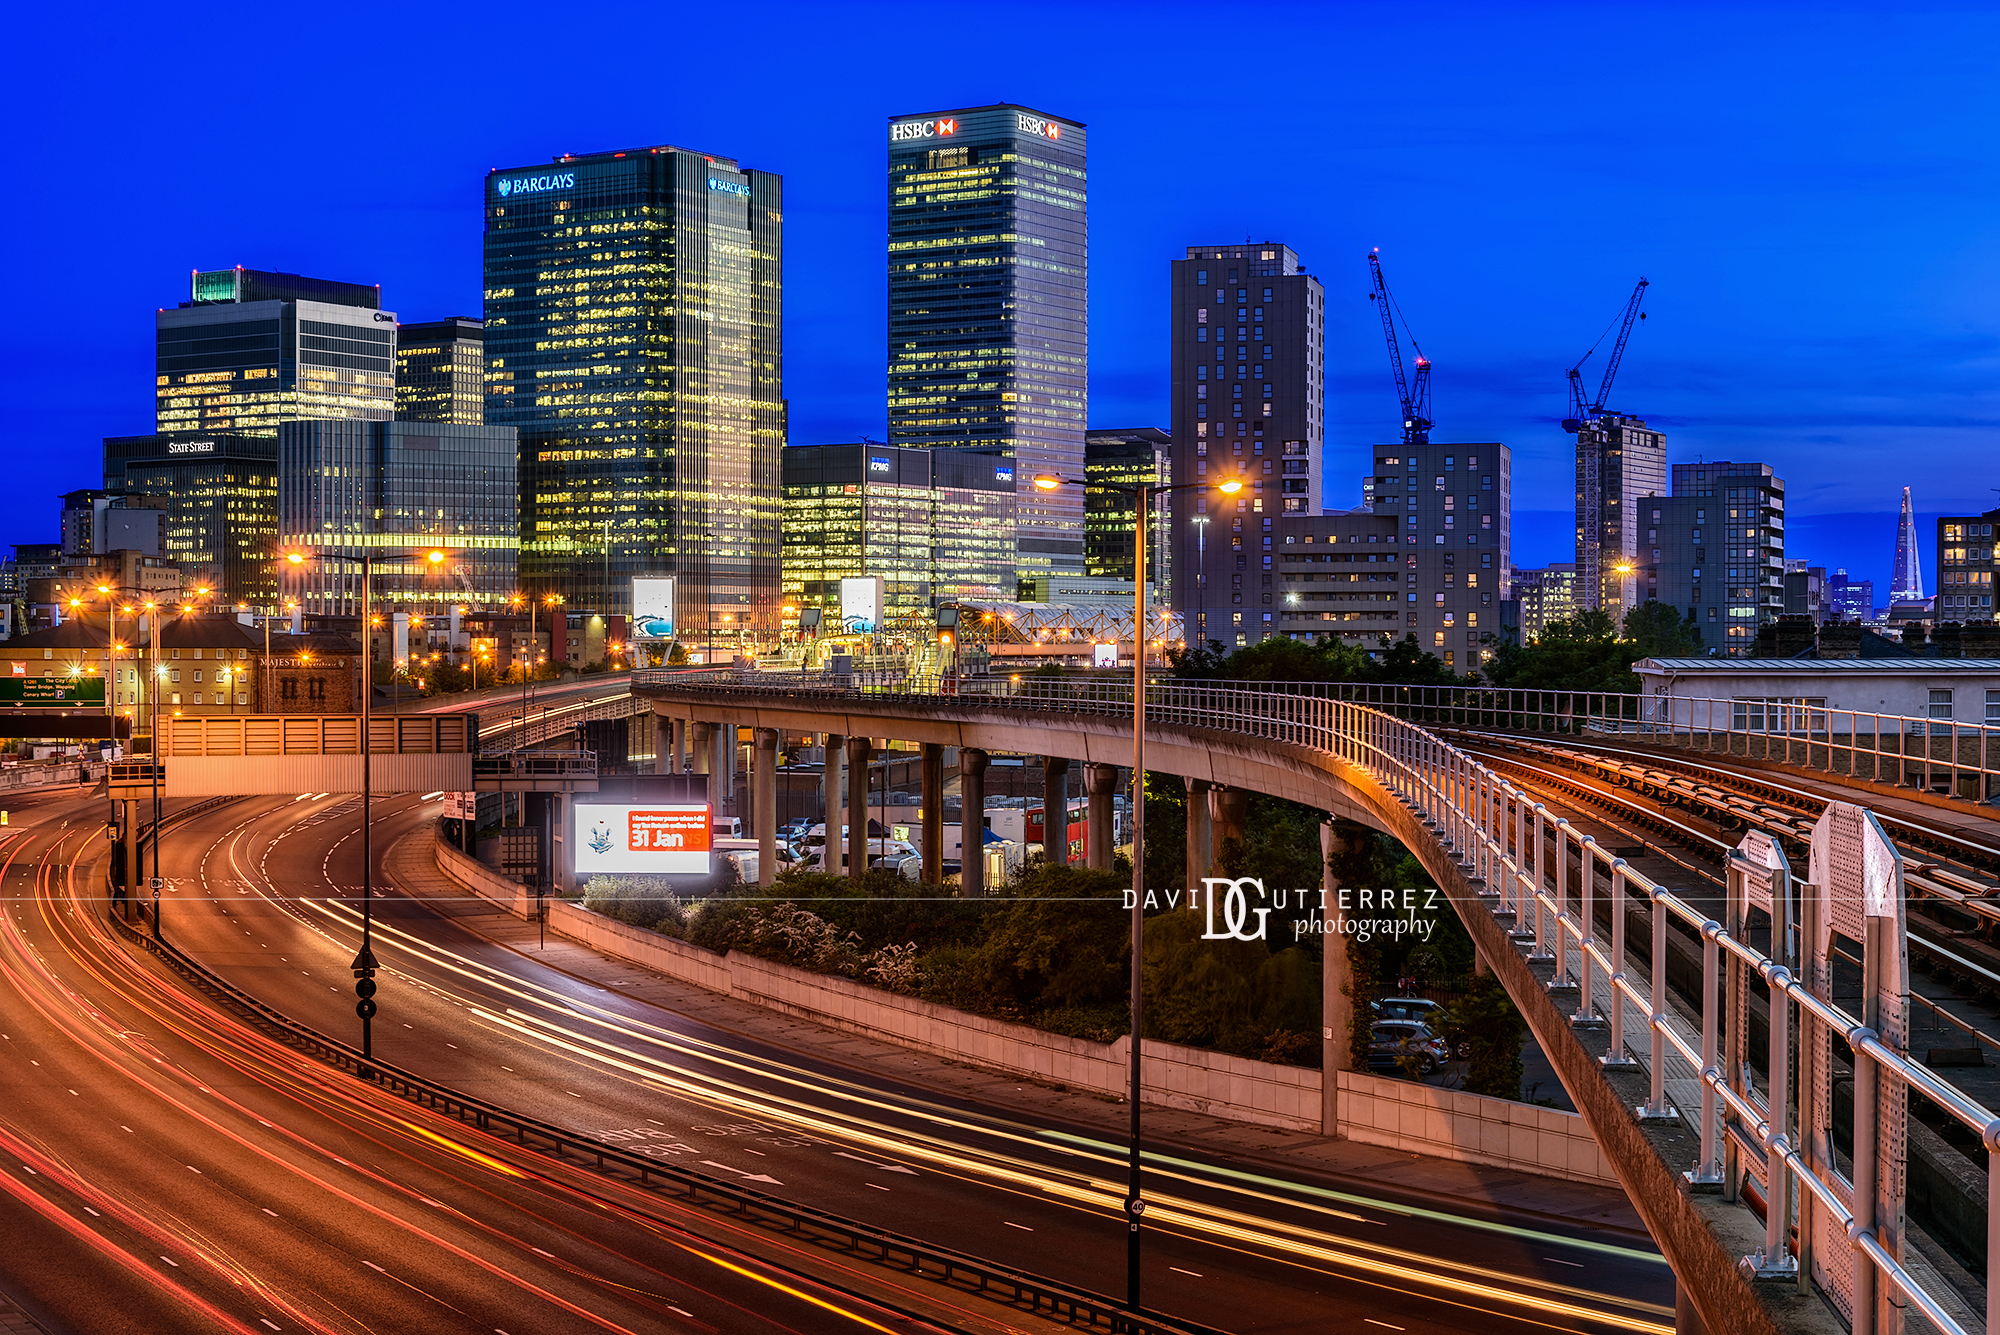 """Blue Interval"" Docklands, London, UK by David Gutierrez Photography, London Photographer"